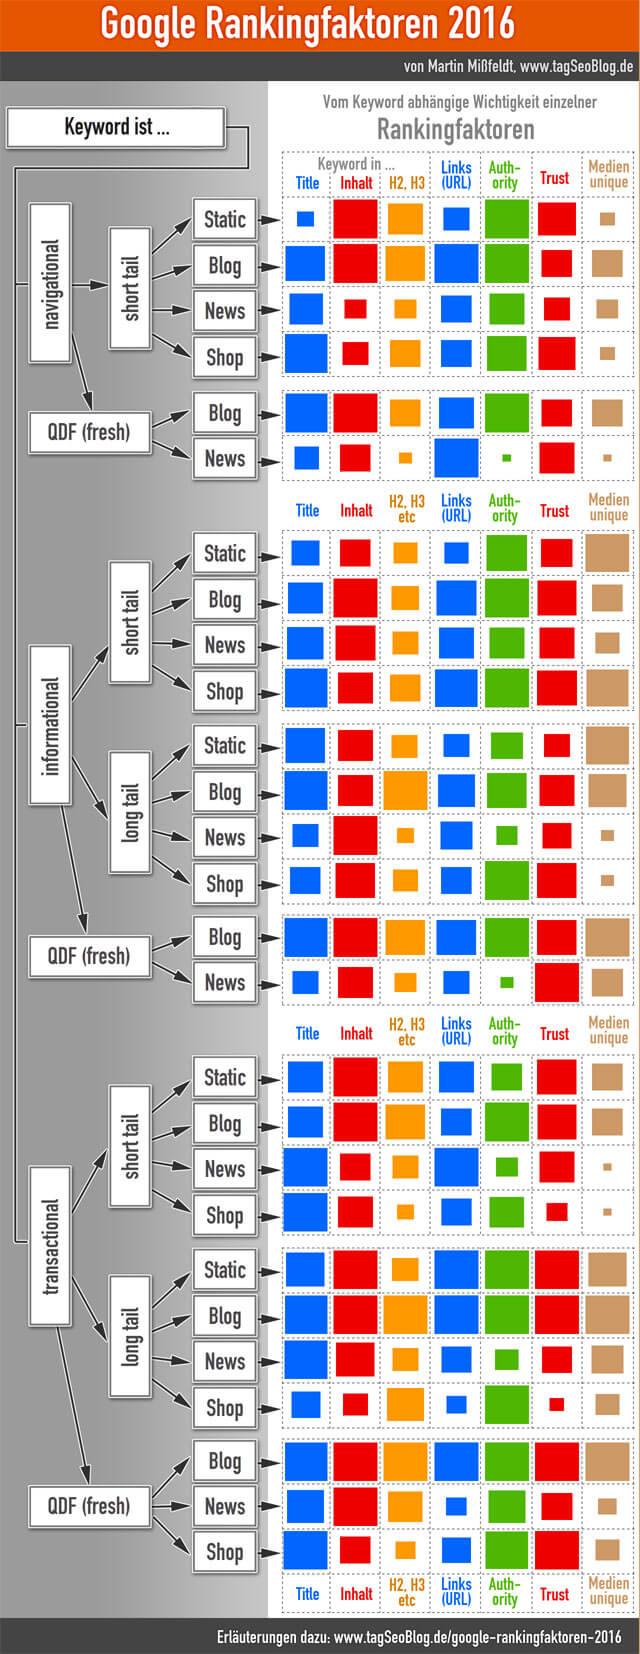 SEO Rankingfaktoren 2016 - Infografik von Martin Mißfeldt (tagseoblog.de)